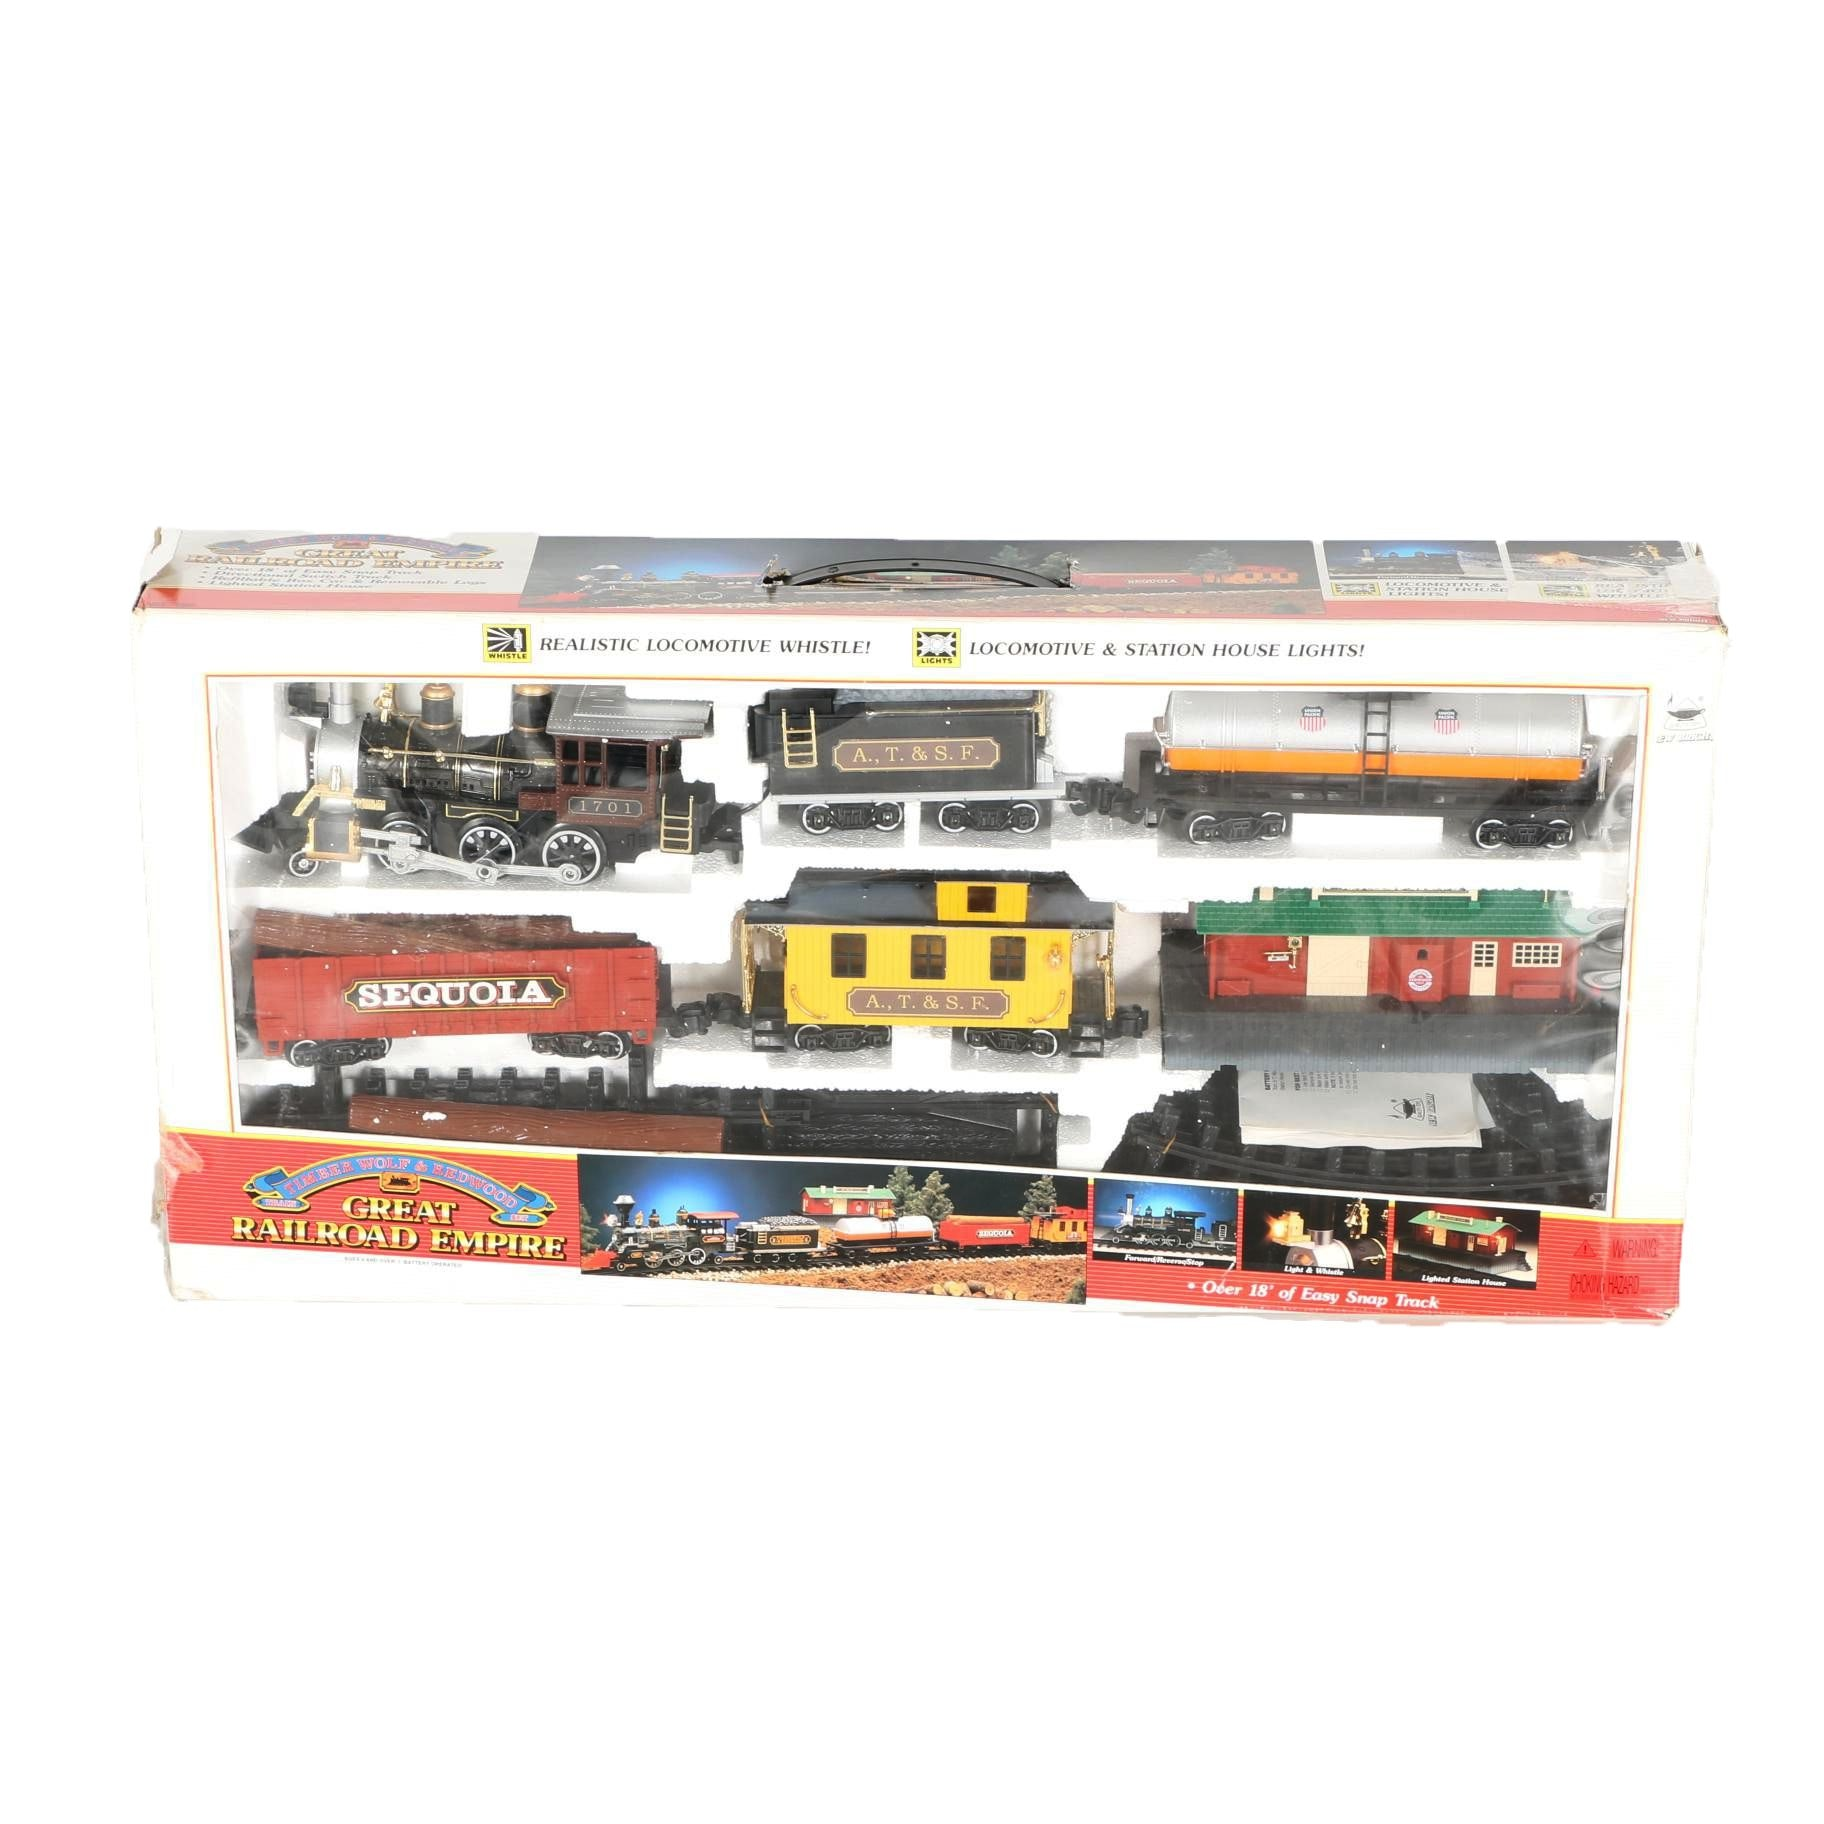 Timberwolf and Redwood Train Set